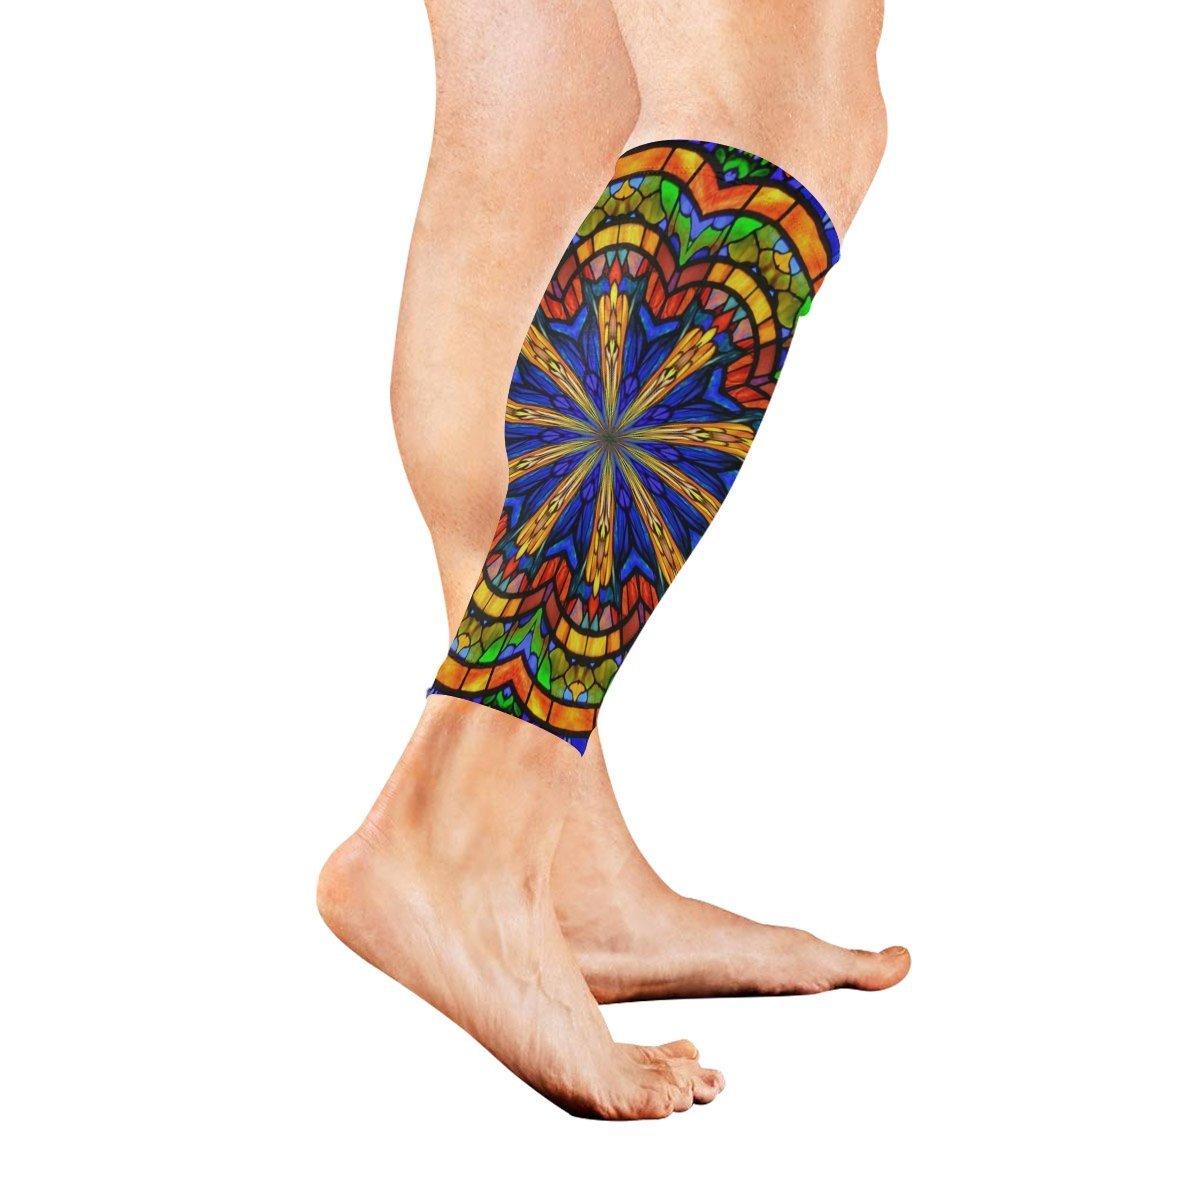 bac5ba045 Amazon.com: LEVEIS Trippy Mandala Calf Compression Sleeves 1 Pair, Leg  Performance Support for Shin Splint Calf Pain Relief Men & Women Guards  Sleeves for ...